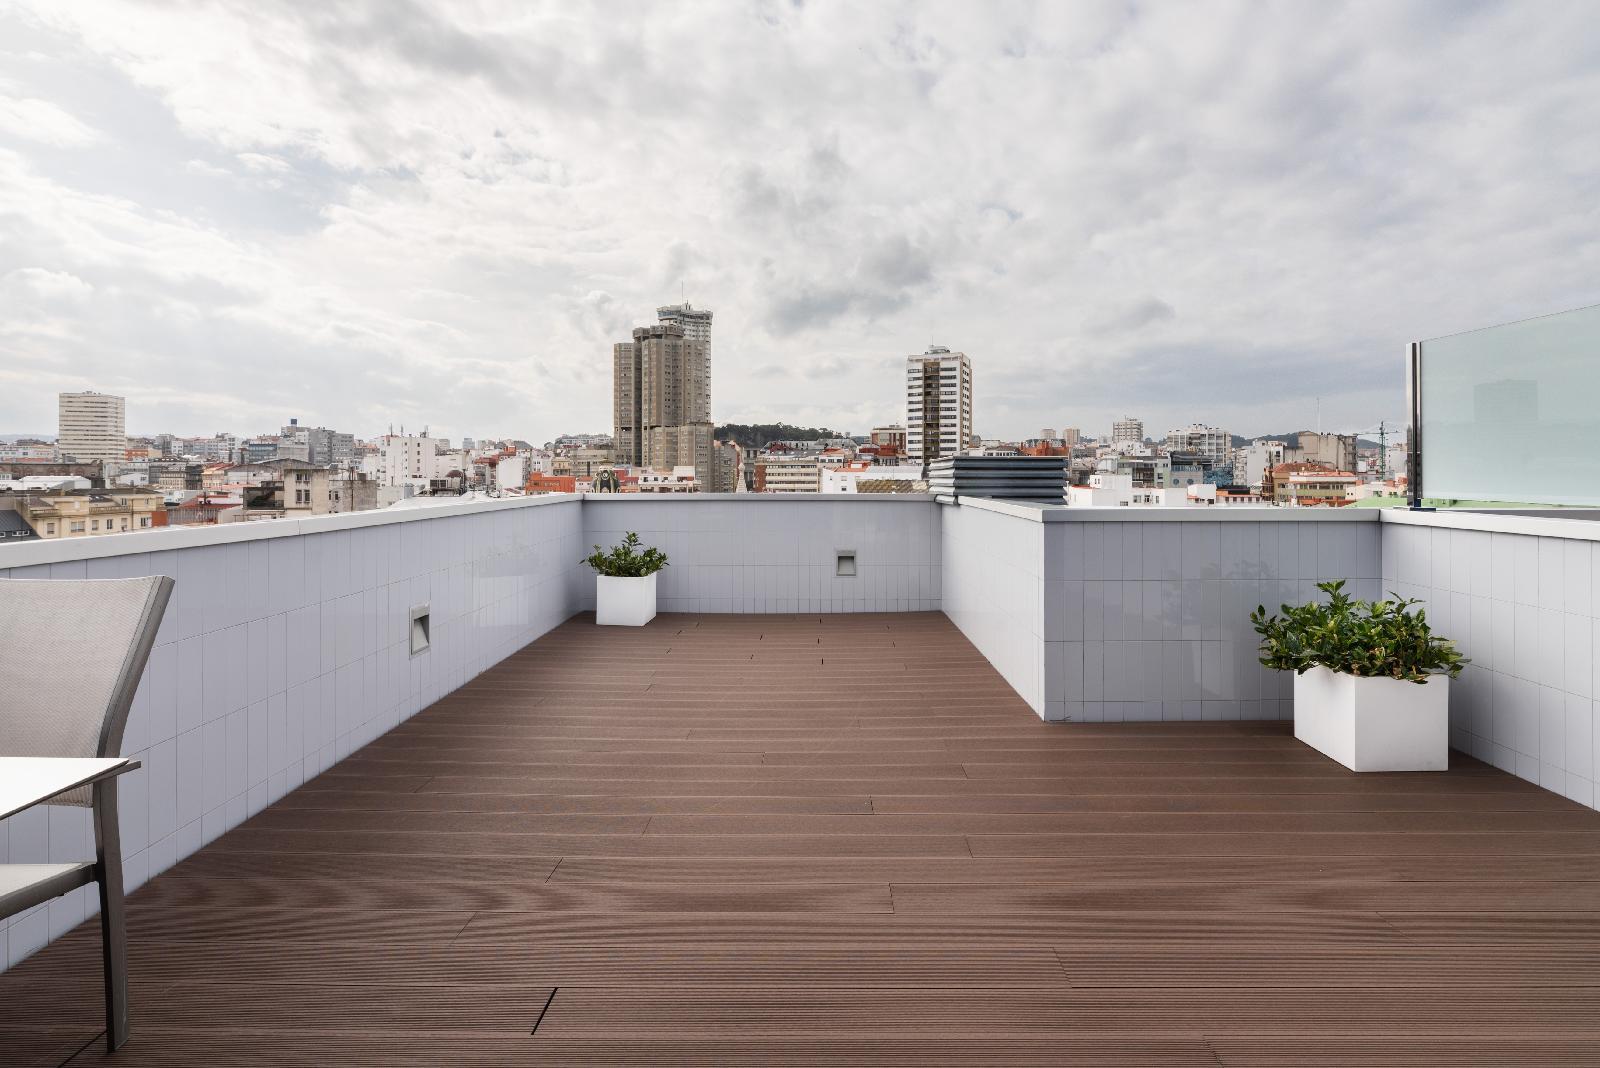 2. Eurostars Blue Coruña